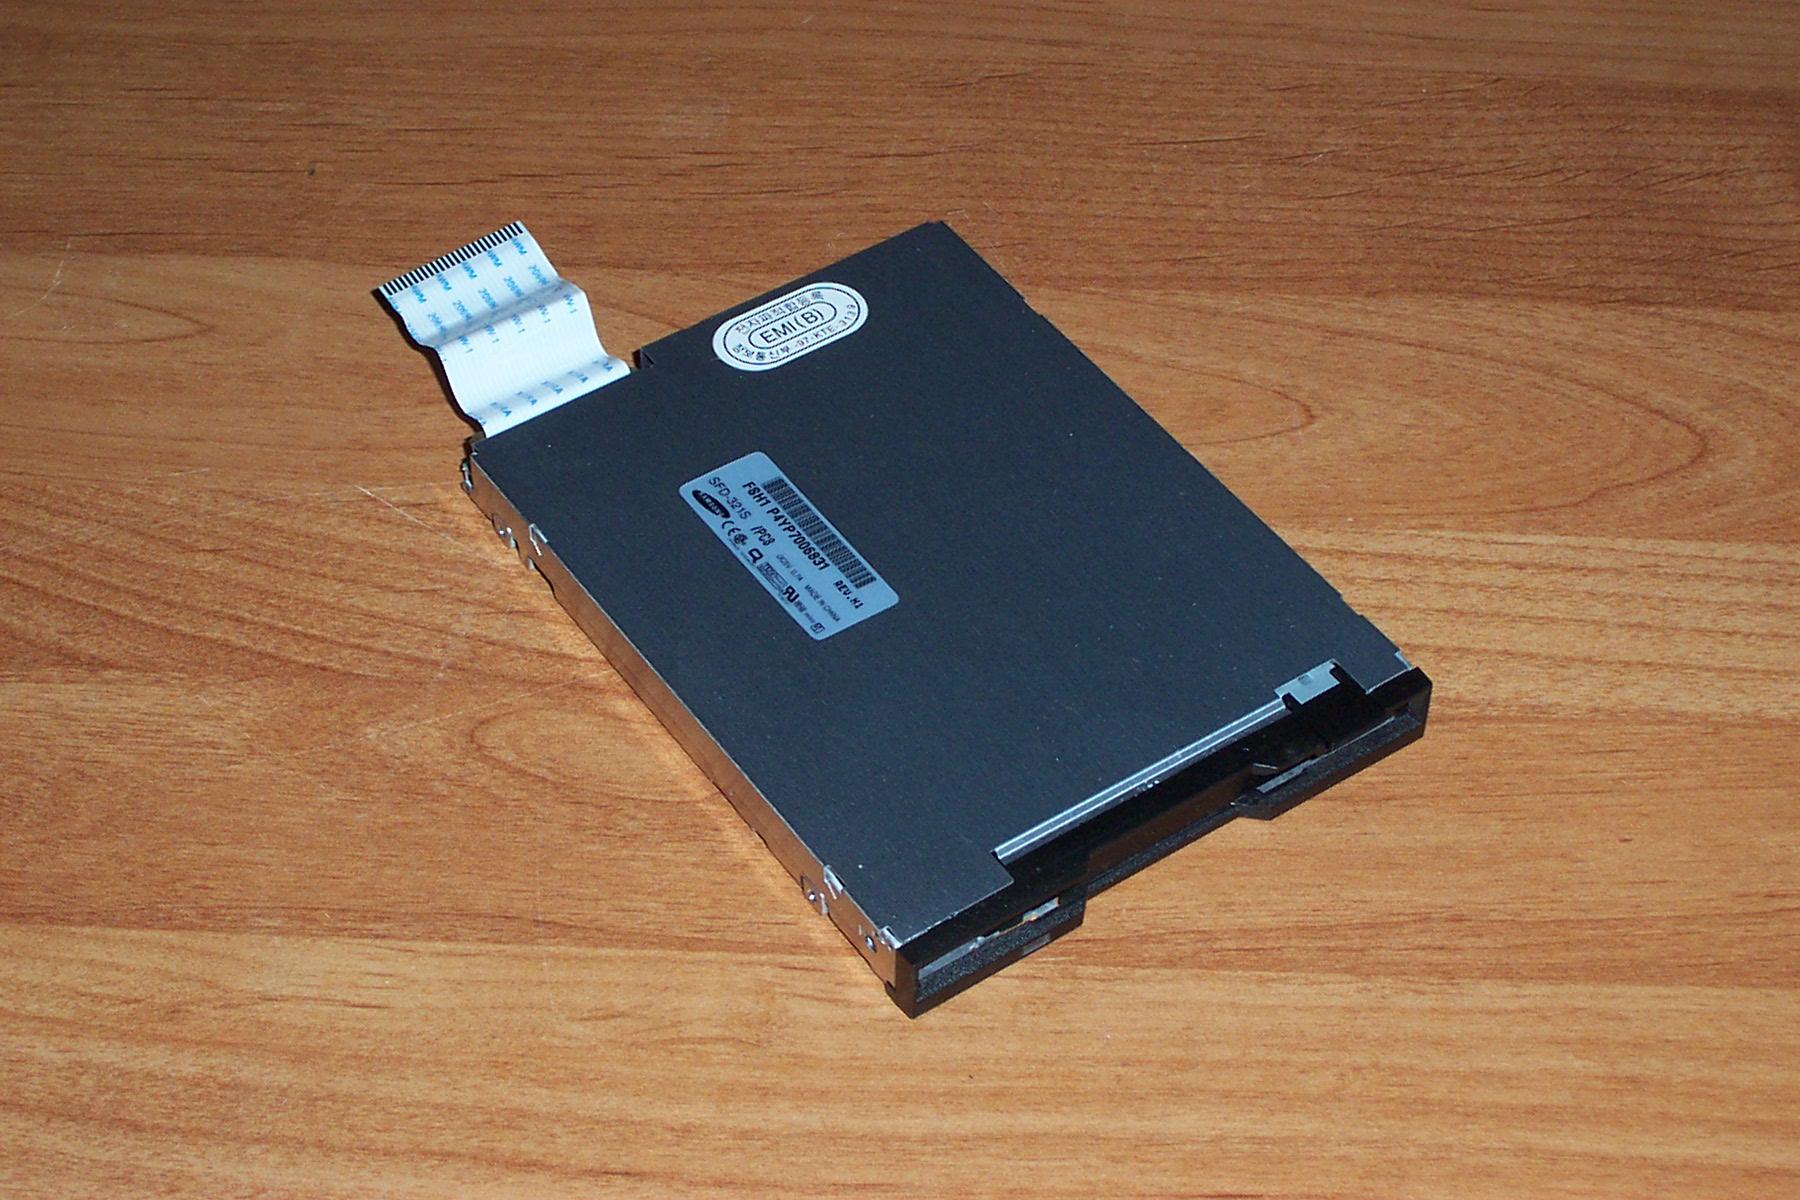 Usb floppy disk drive samsung sfd-321u